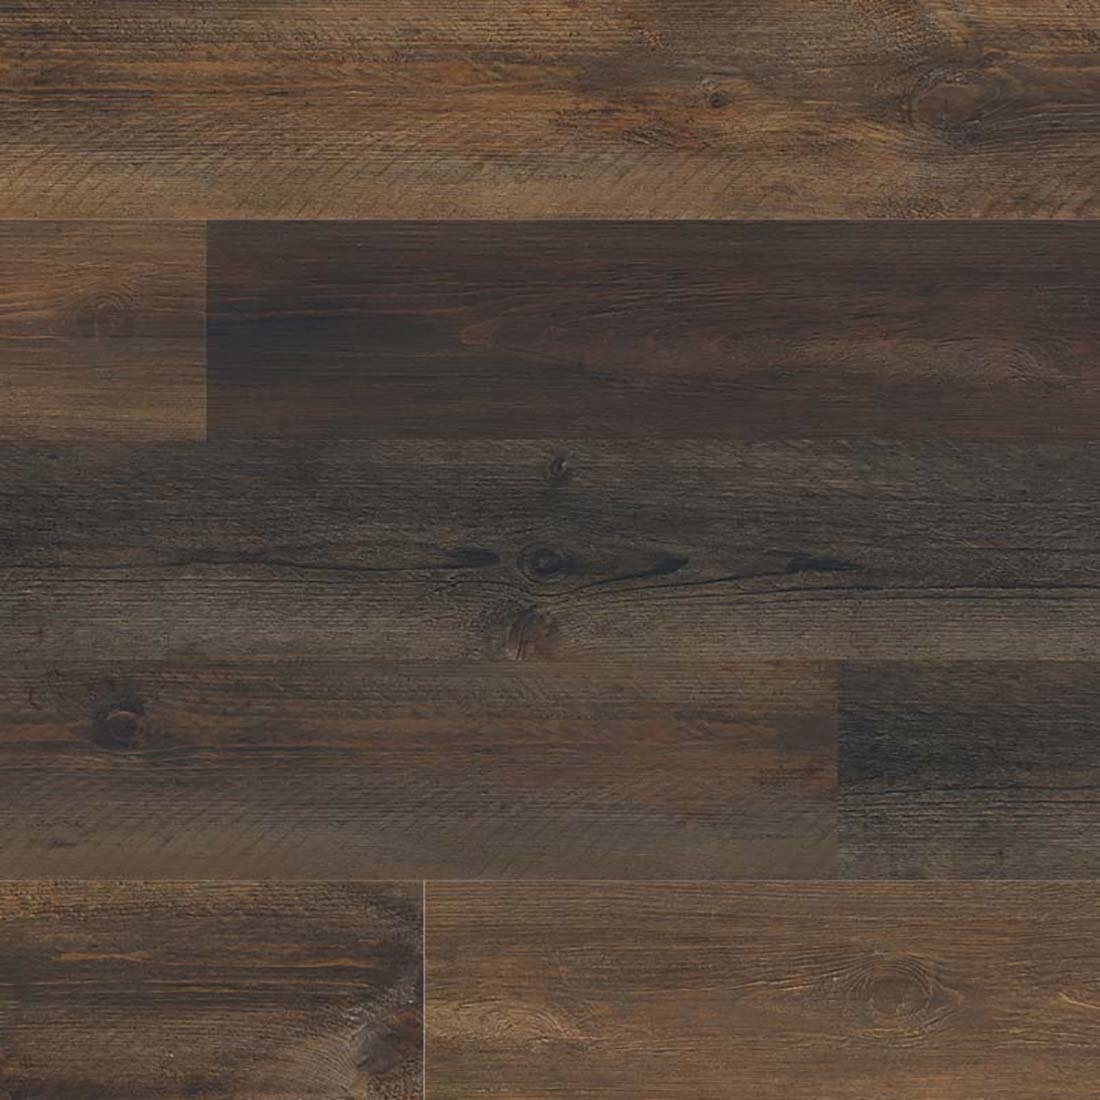 Seasoned Cherry / 6.5mm / SPC / Click Lock Vinyl Planks - 6.5mm SPC Click Lock - Lakeshore Collection 0